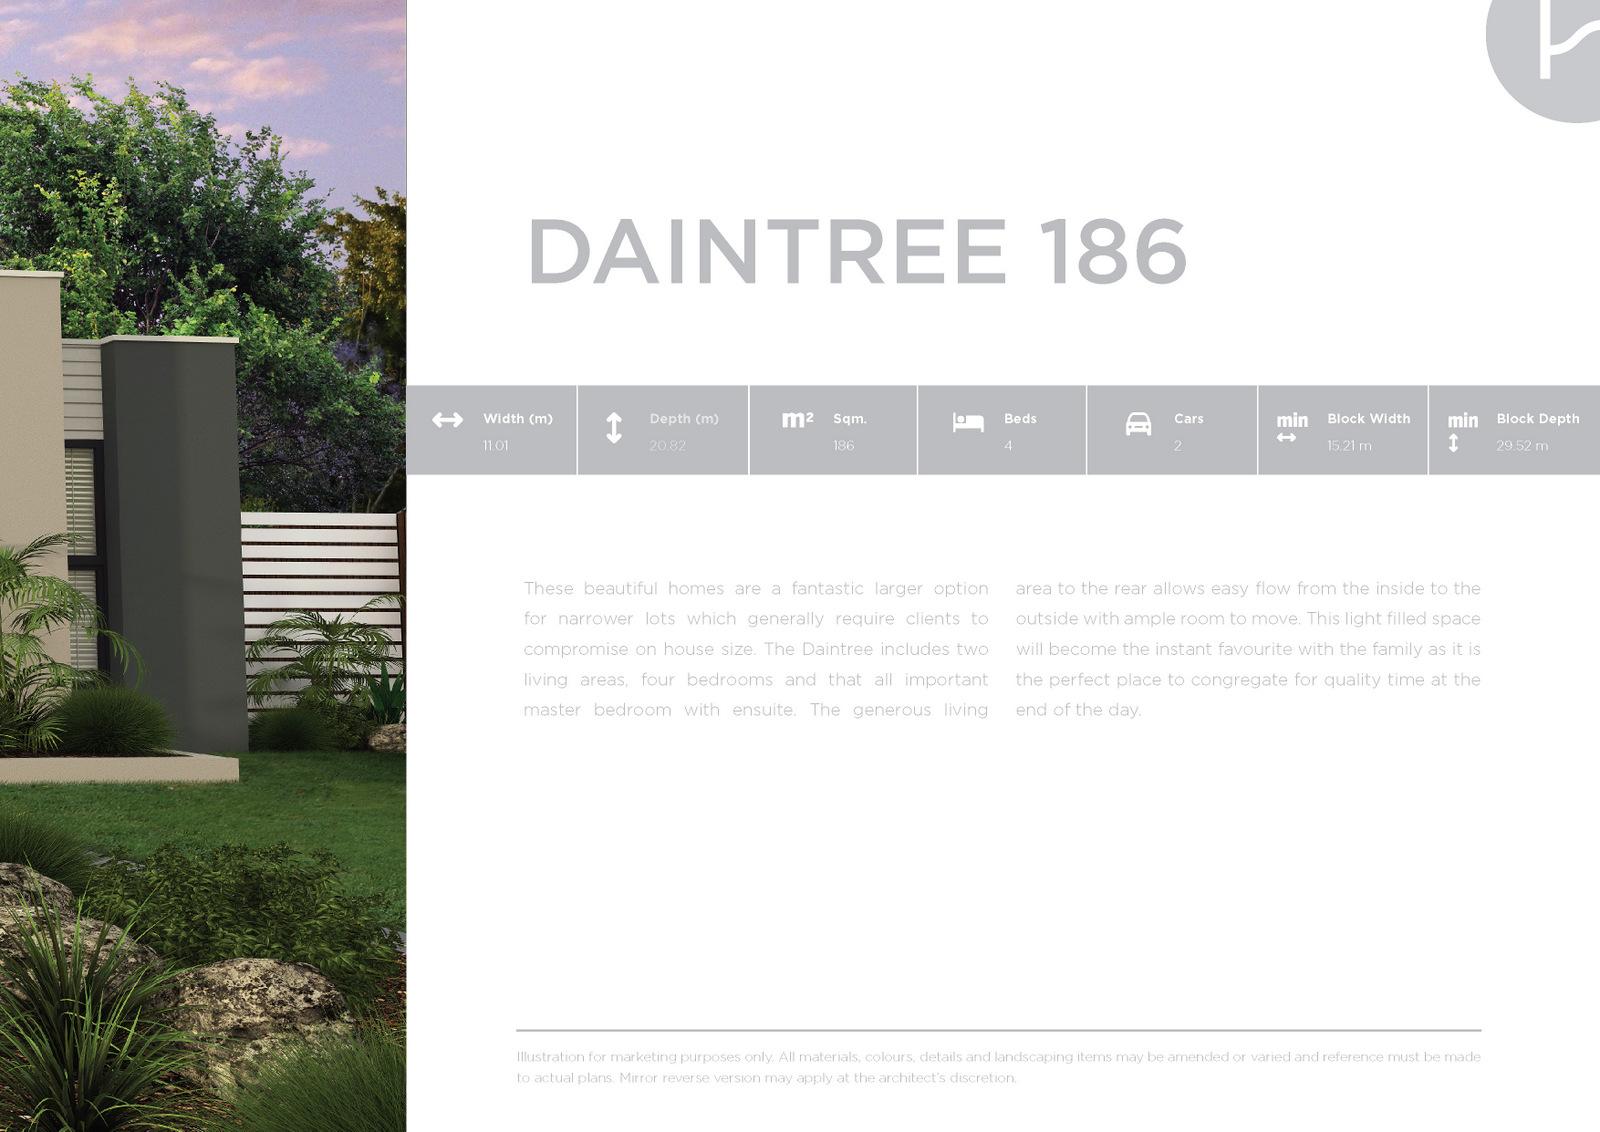 The Daintree 186